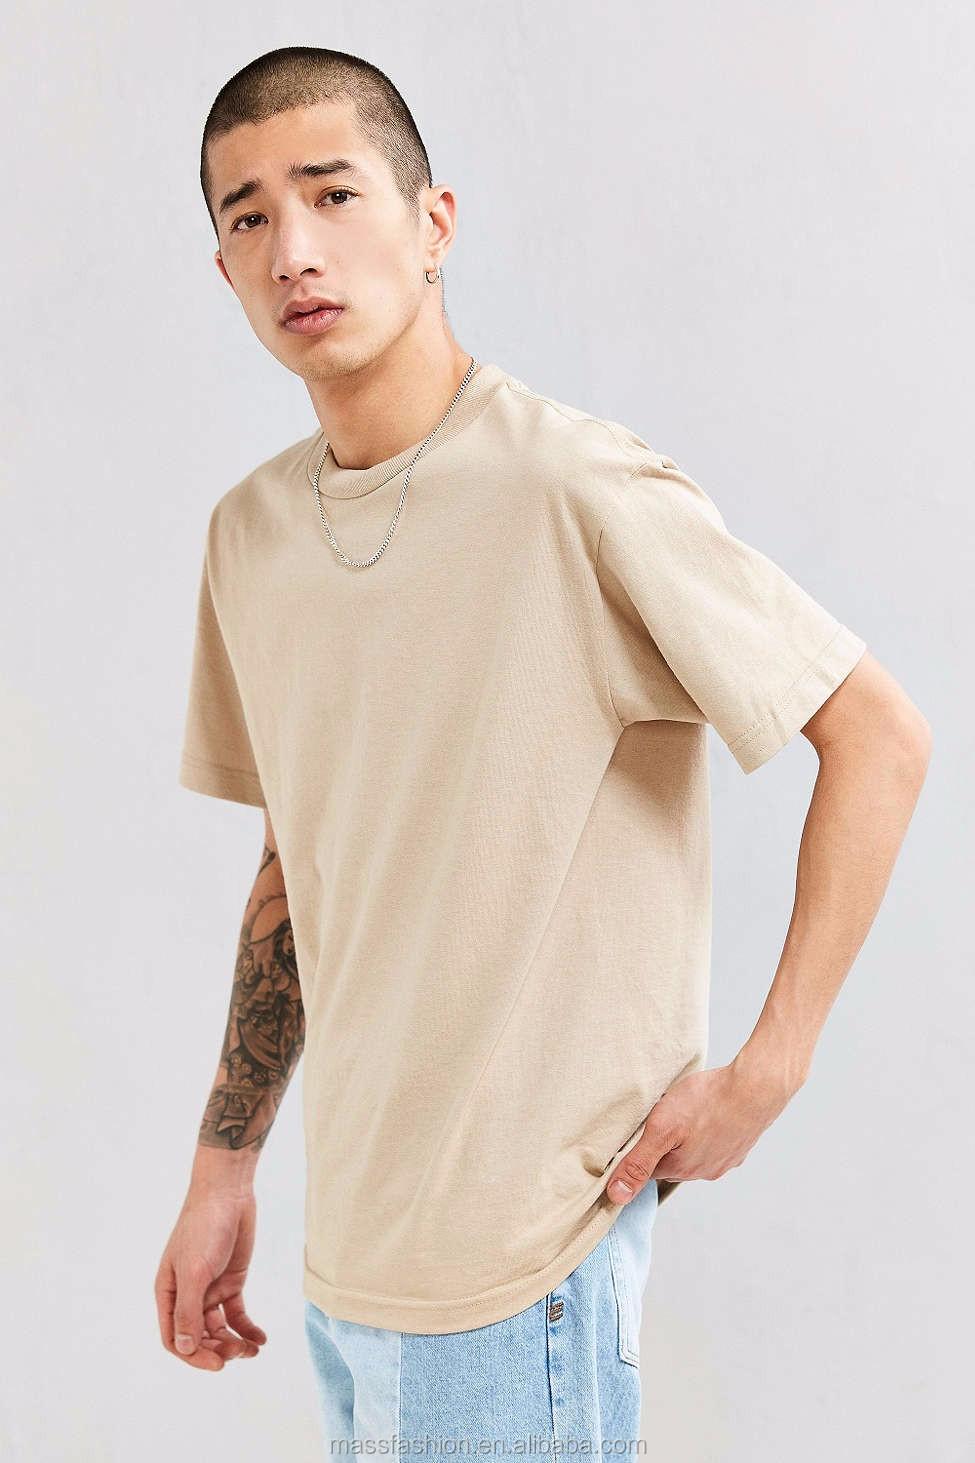 Wholesale Mens Blank Plain Tee Shirt Longline Extended Man T Tendencies Tshirt Super Rock Putih S 15 16